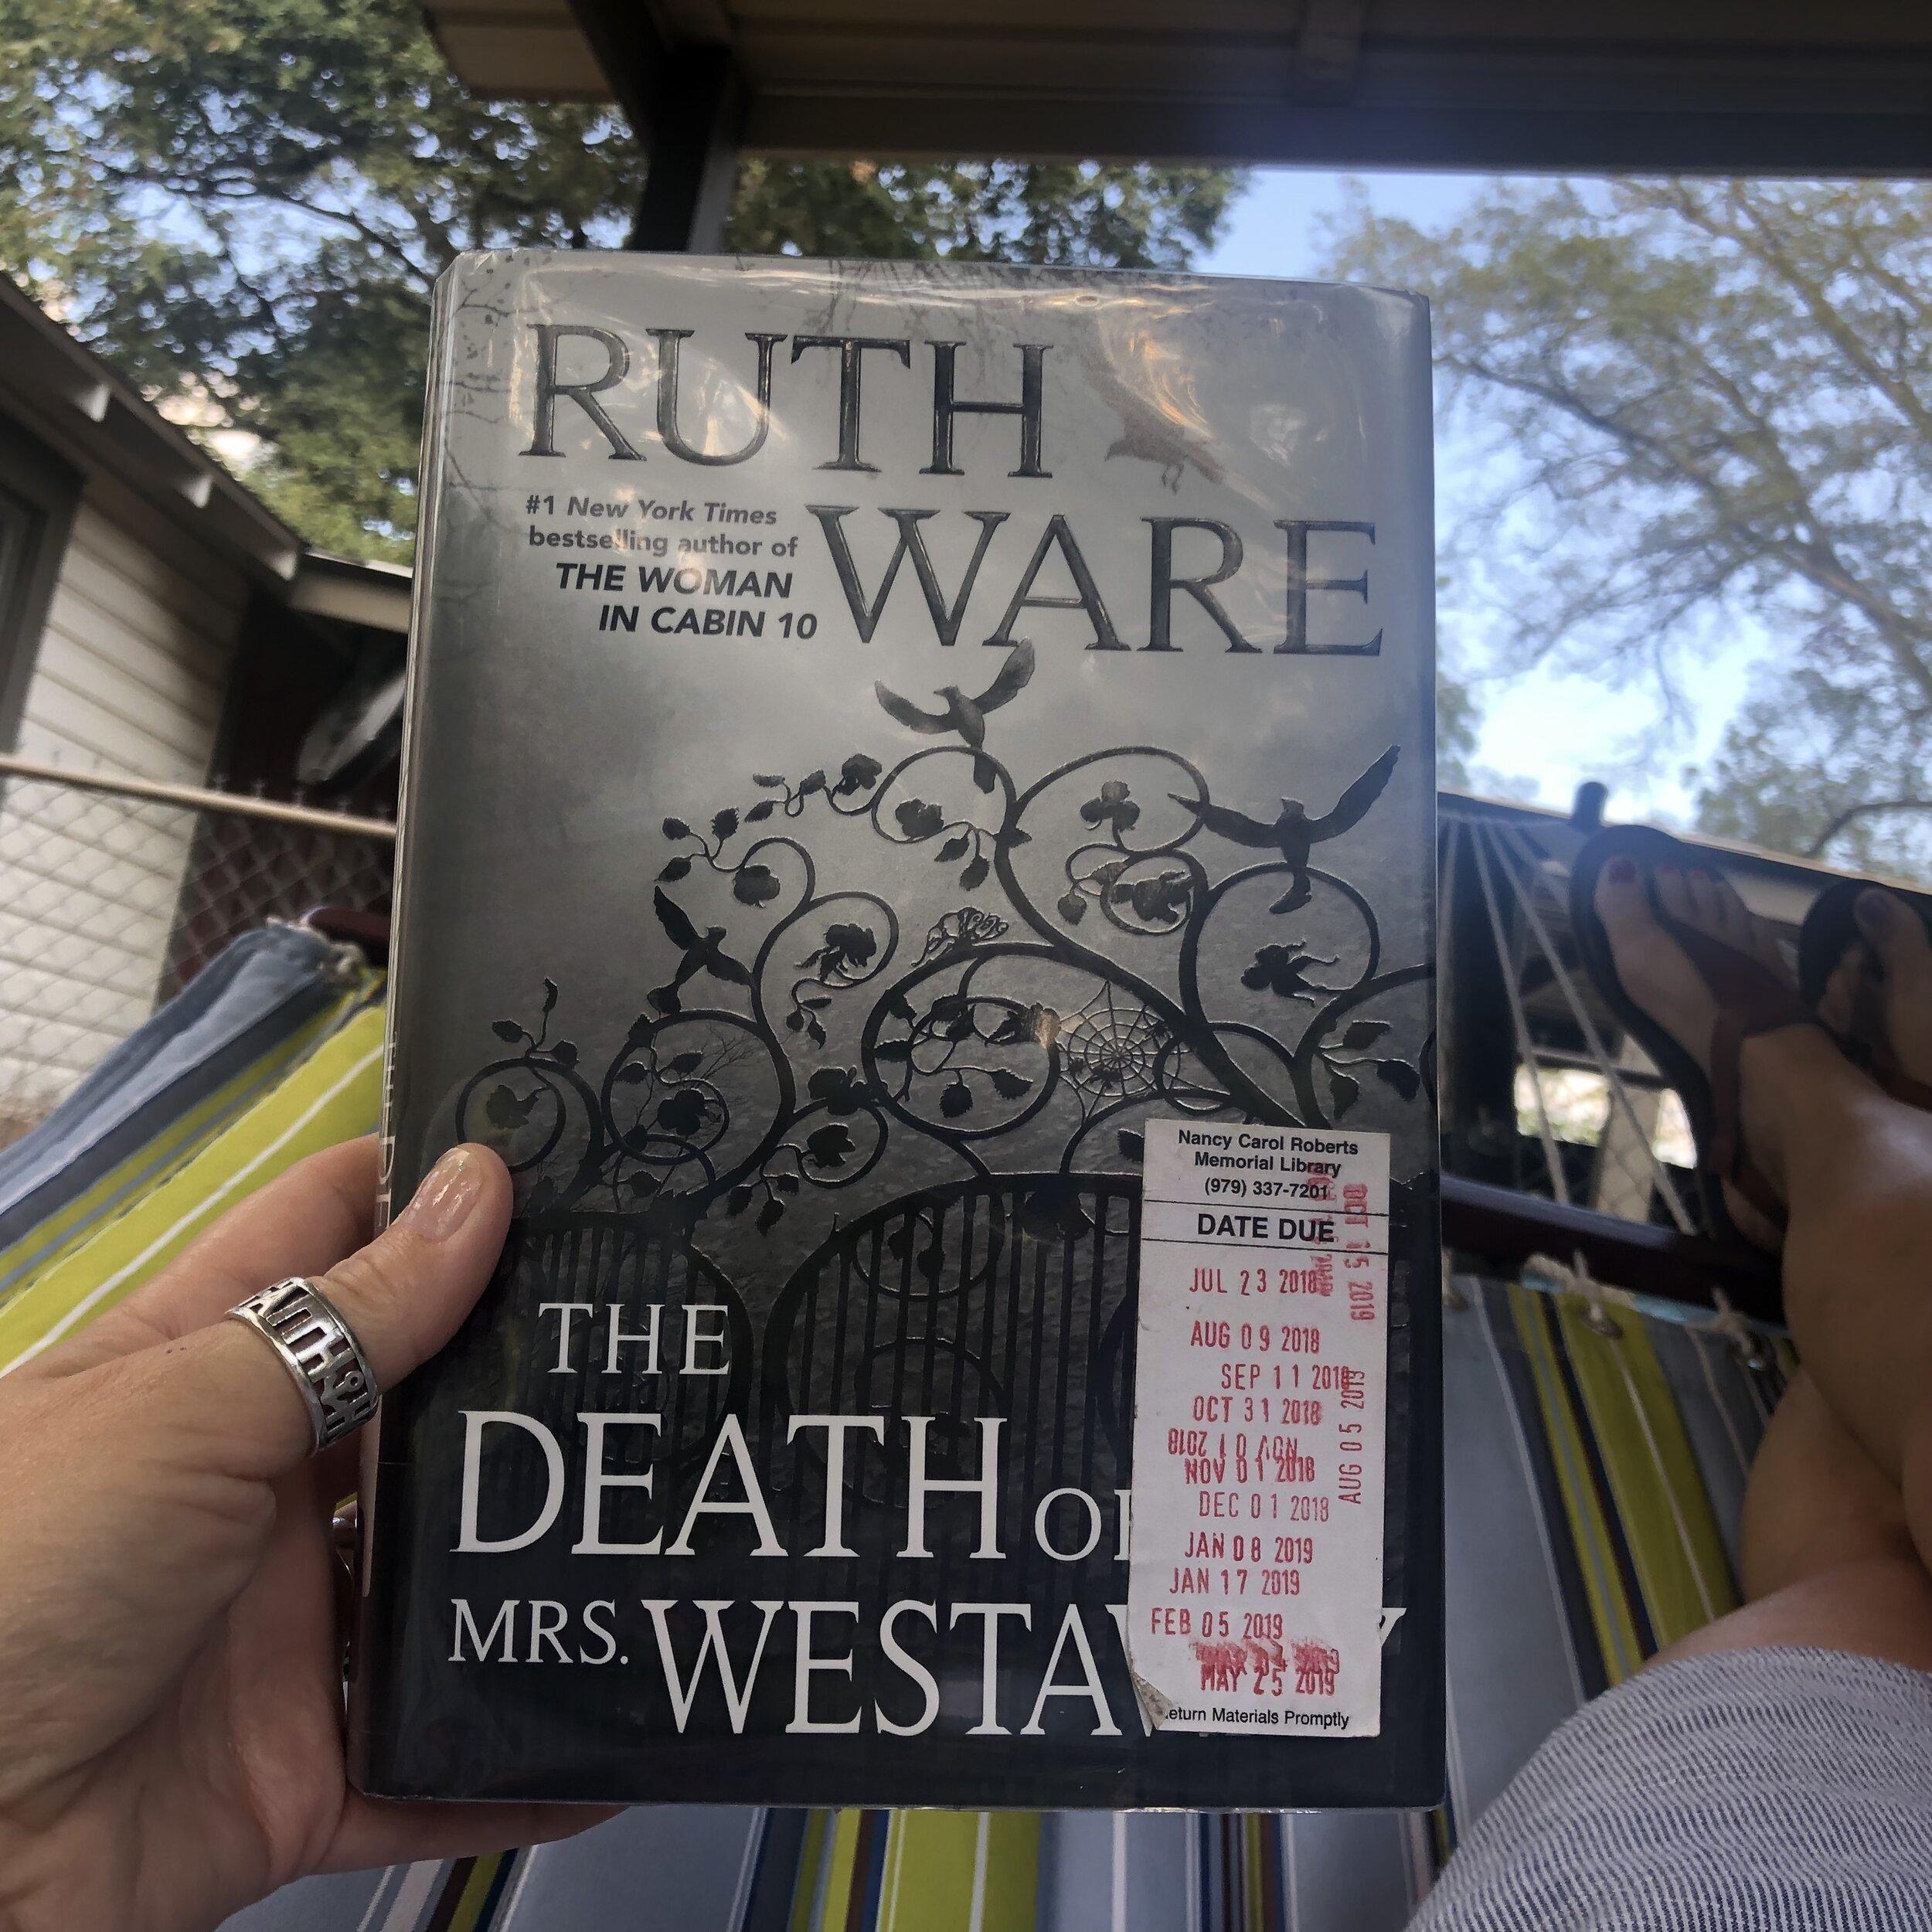 deathofmrswestaway.jpg